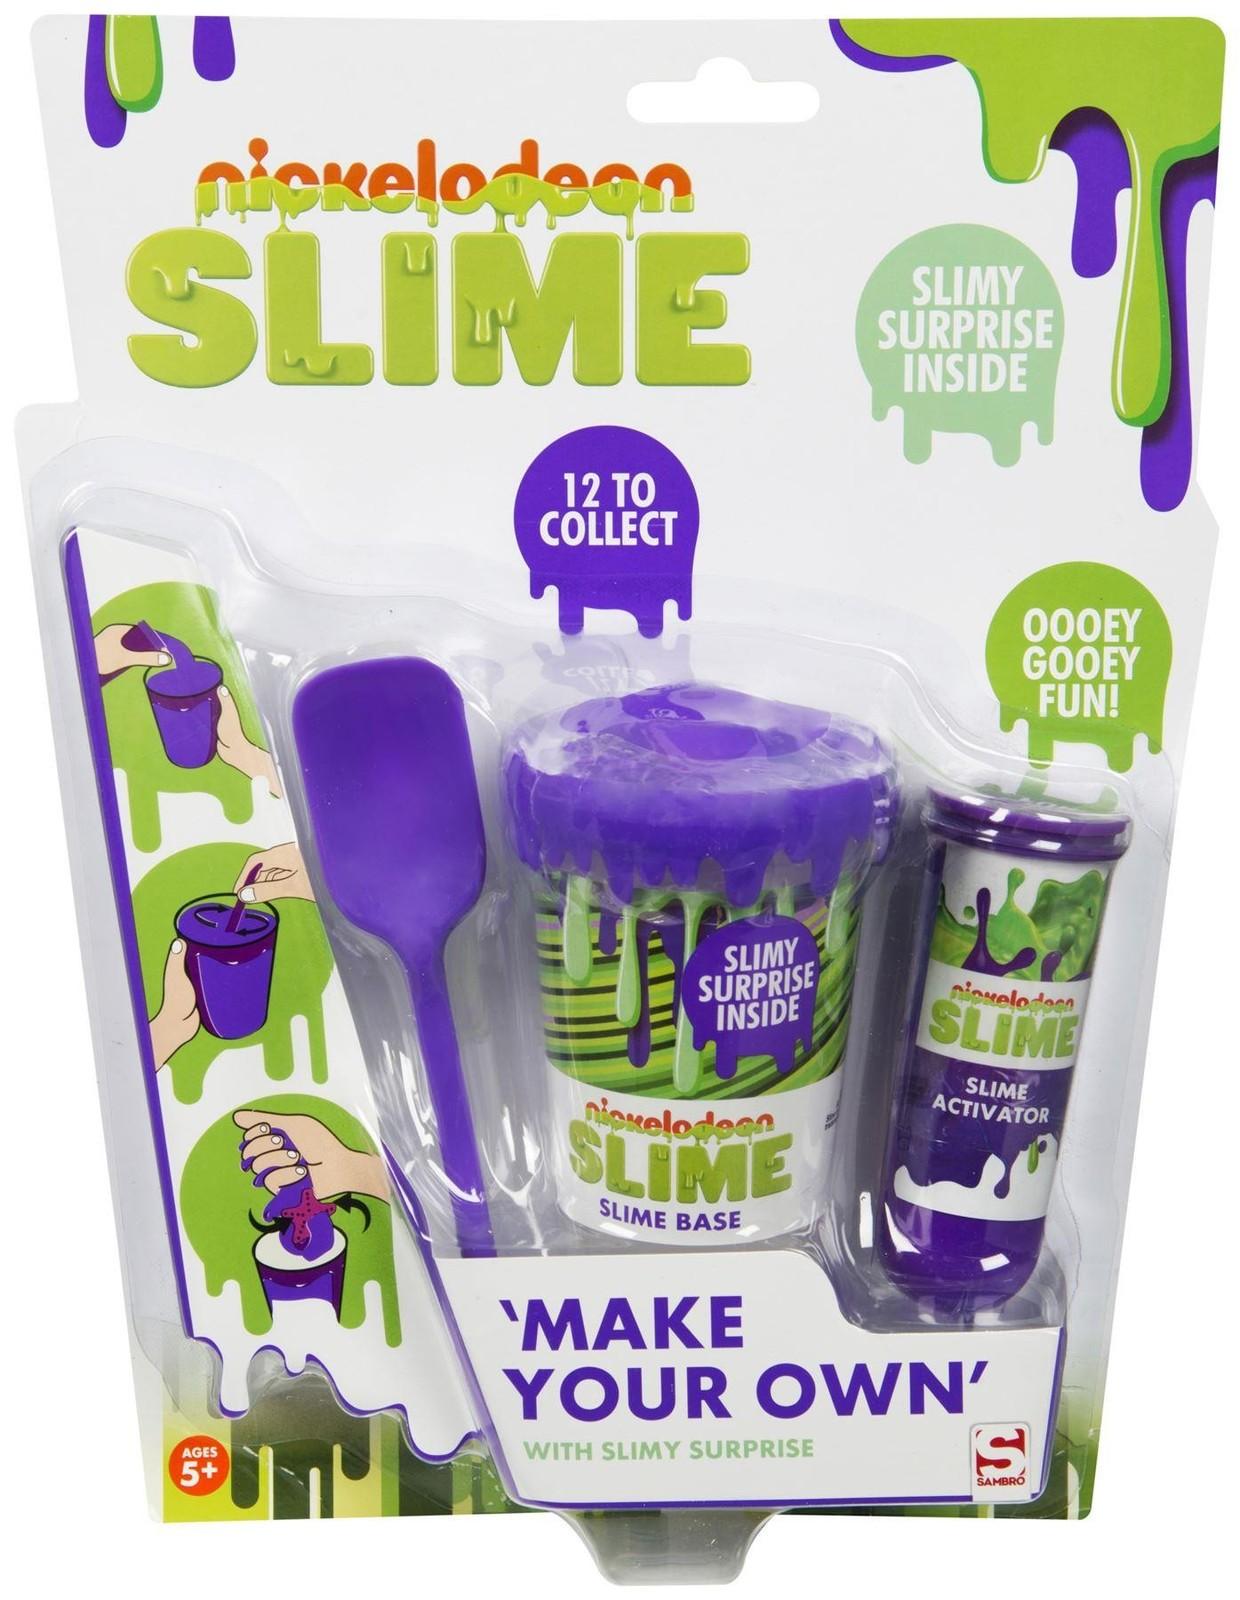 Nickelodeon: Make Your Own Slime Set - Purple image